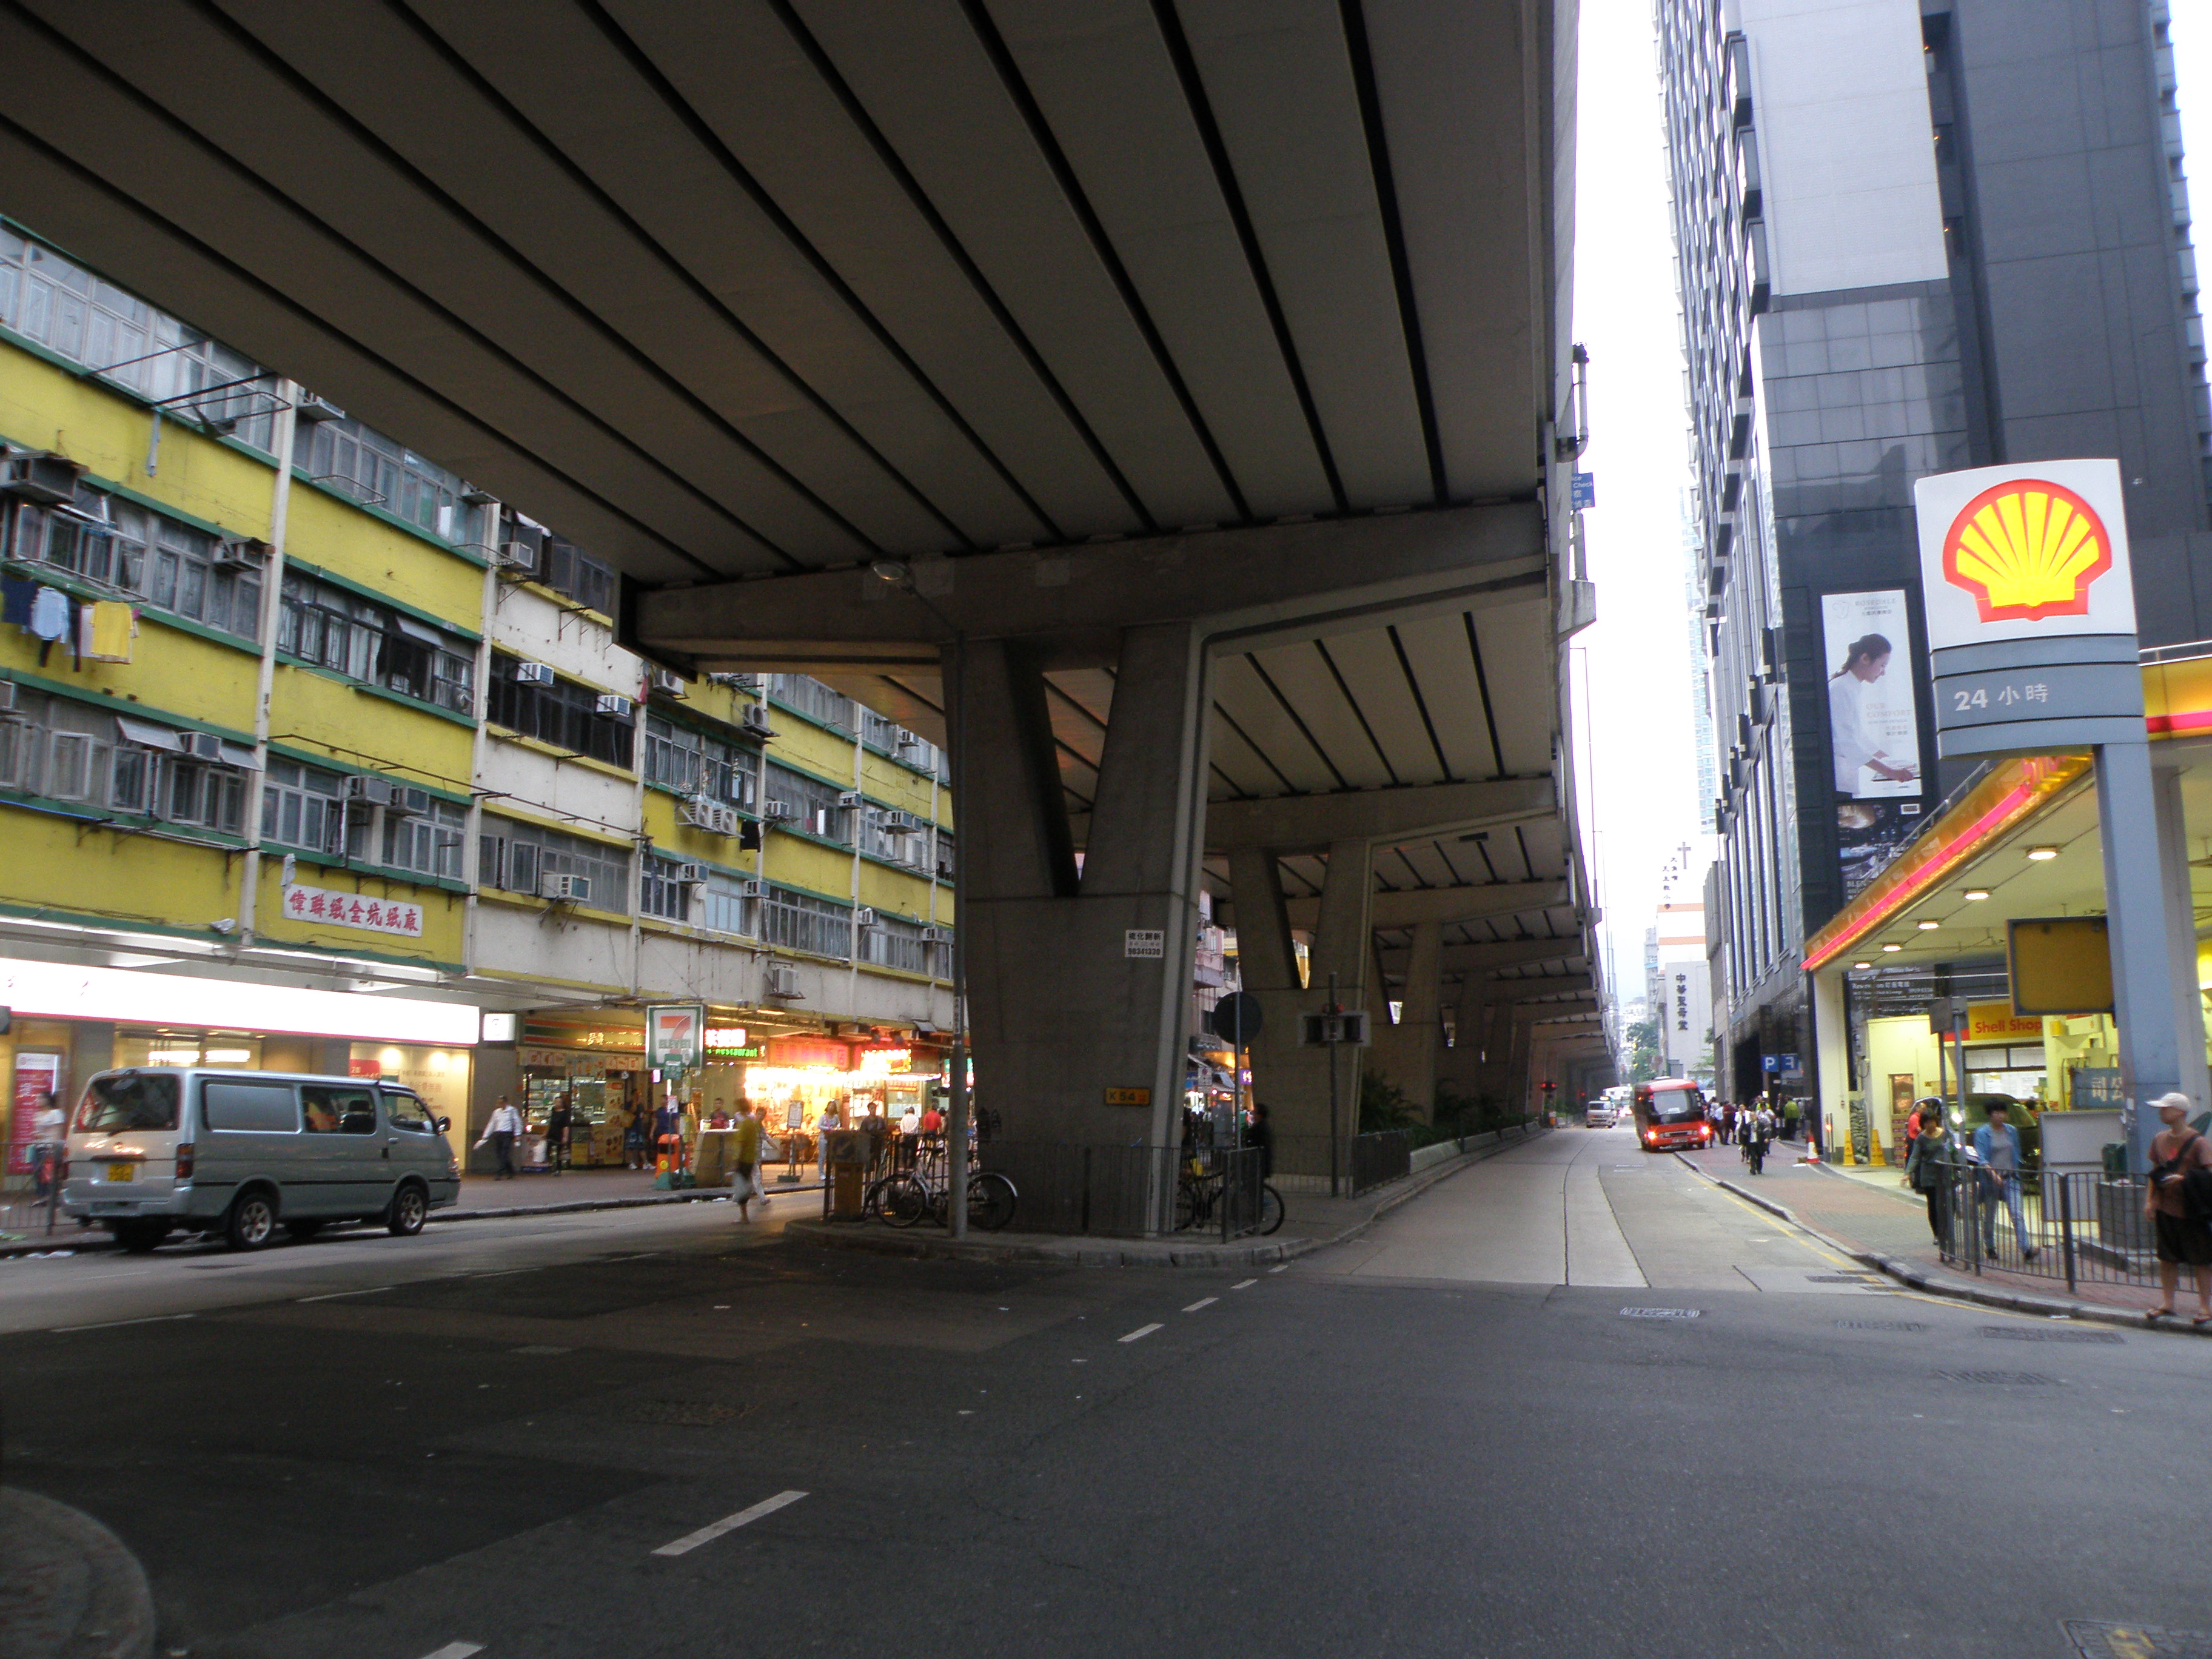 File:Tai Kok Tsui Road.JPG - Wikimedia Commons